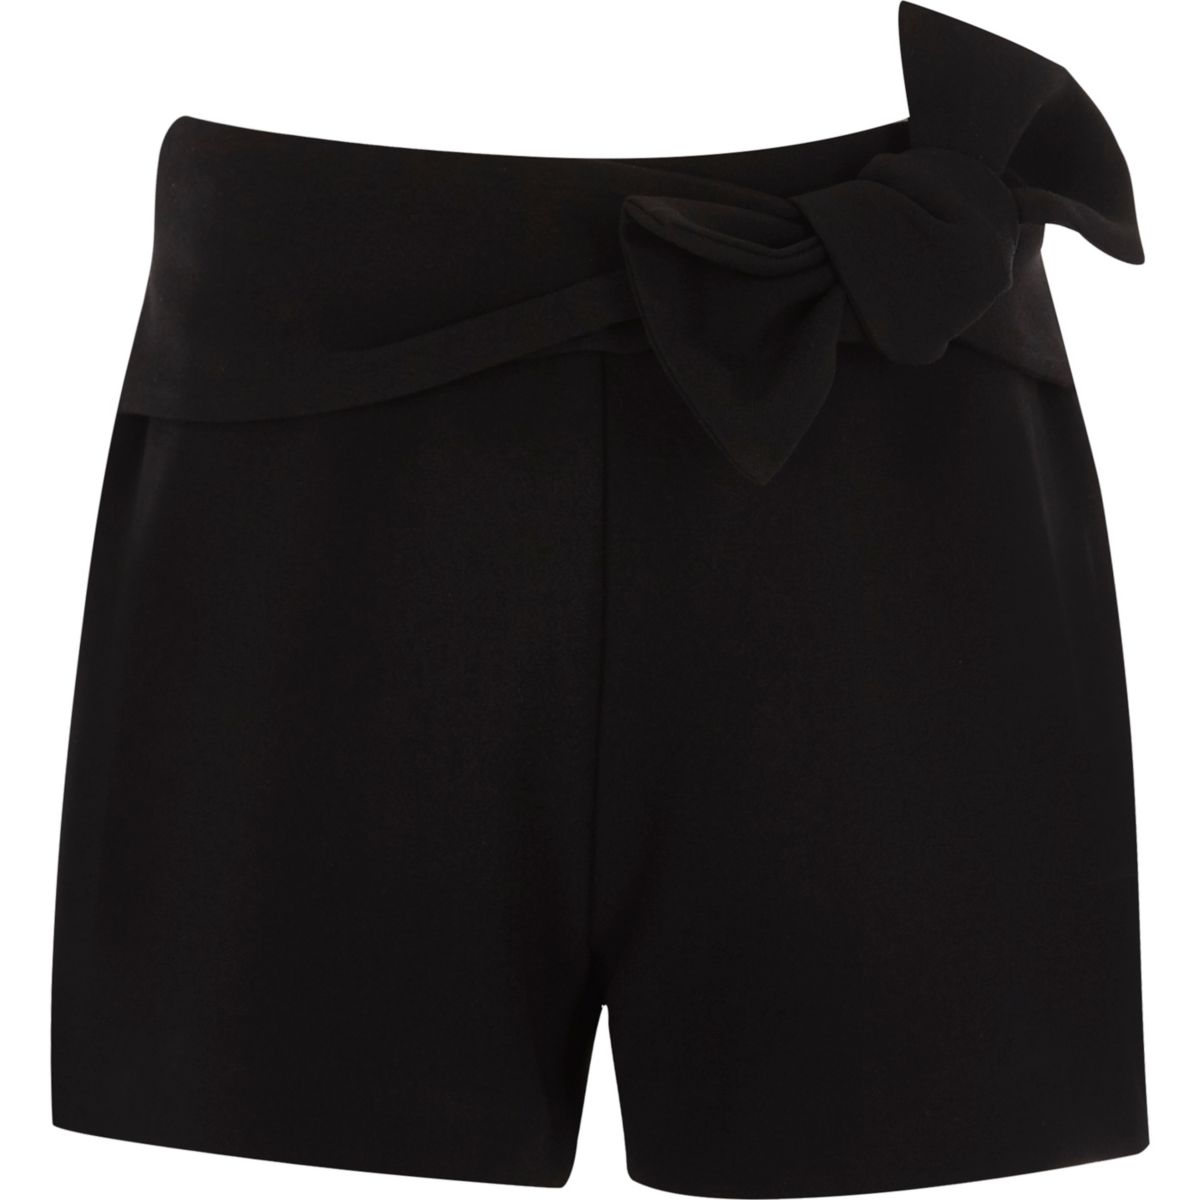 Girls black bow detail shorts